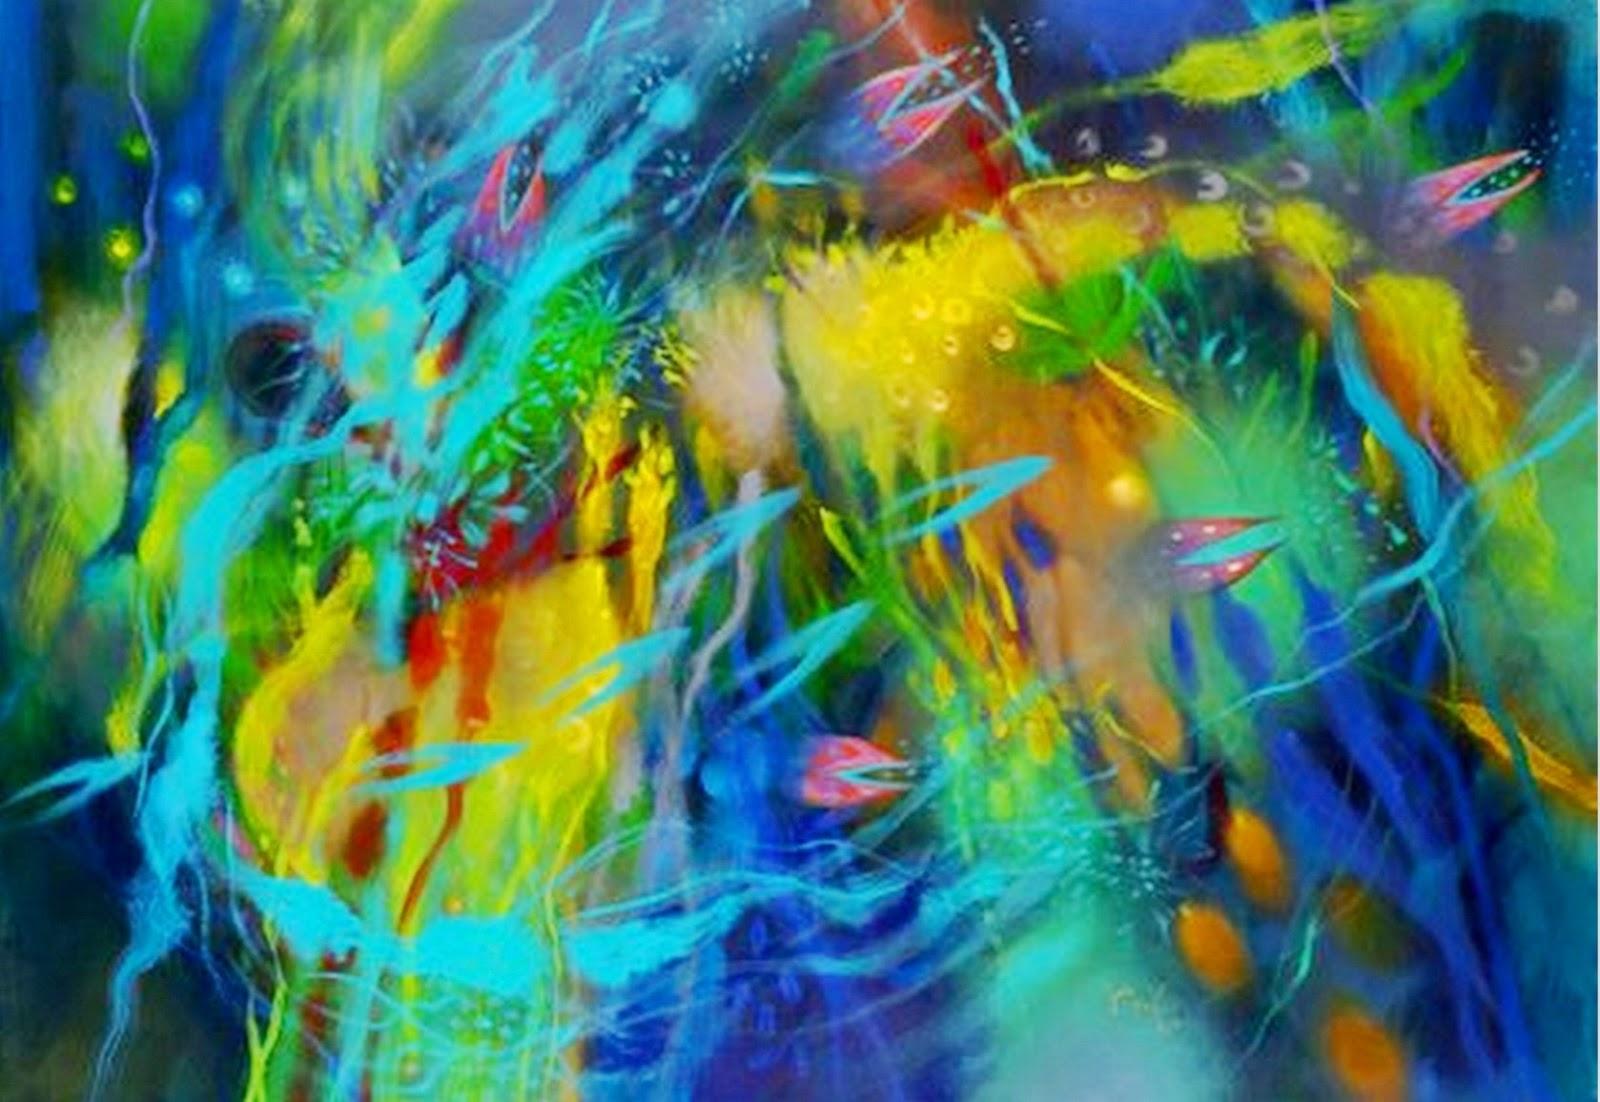 Cuadros pinturas oleos pintura al leo abstracto - Pinturas acrilicas modernas ...